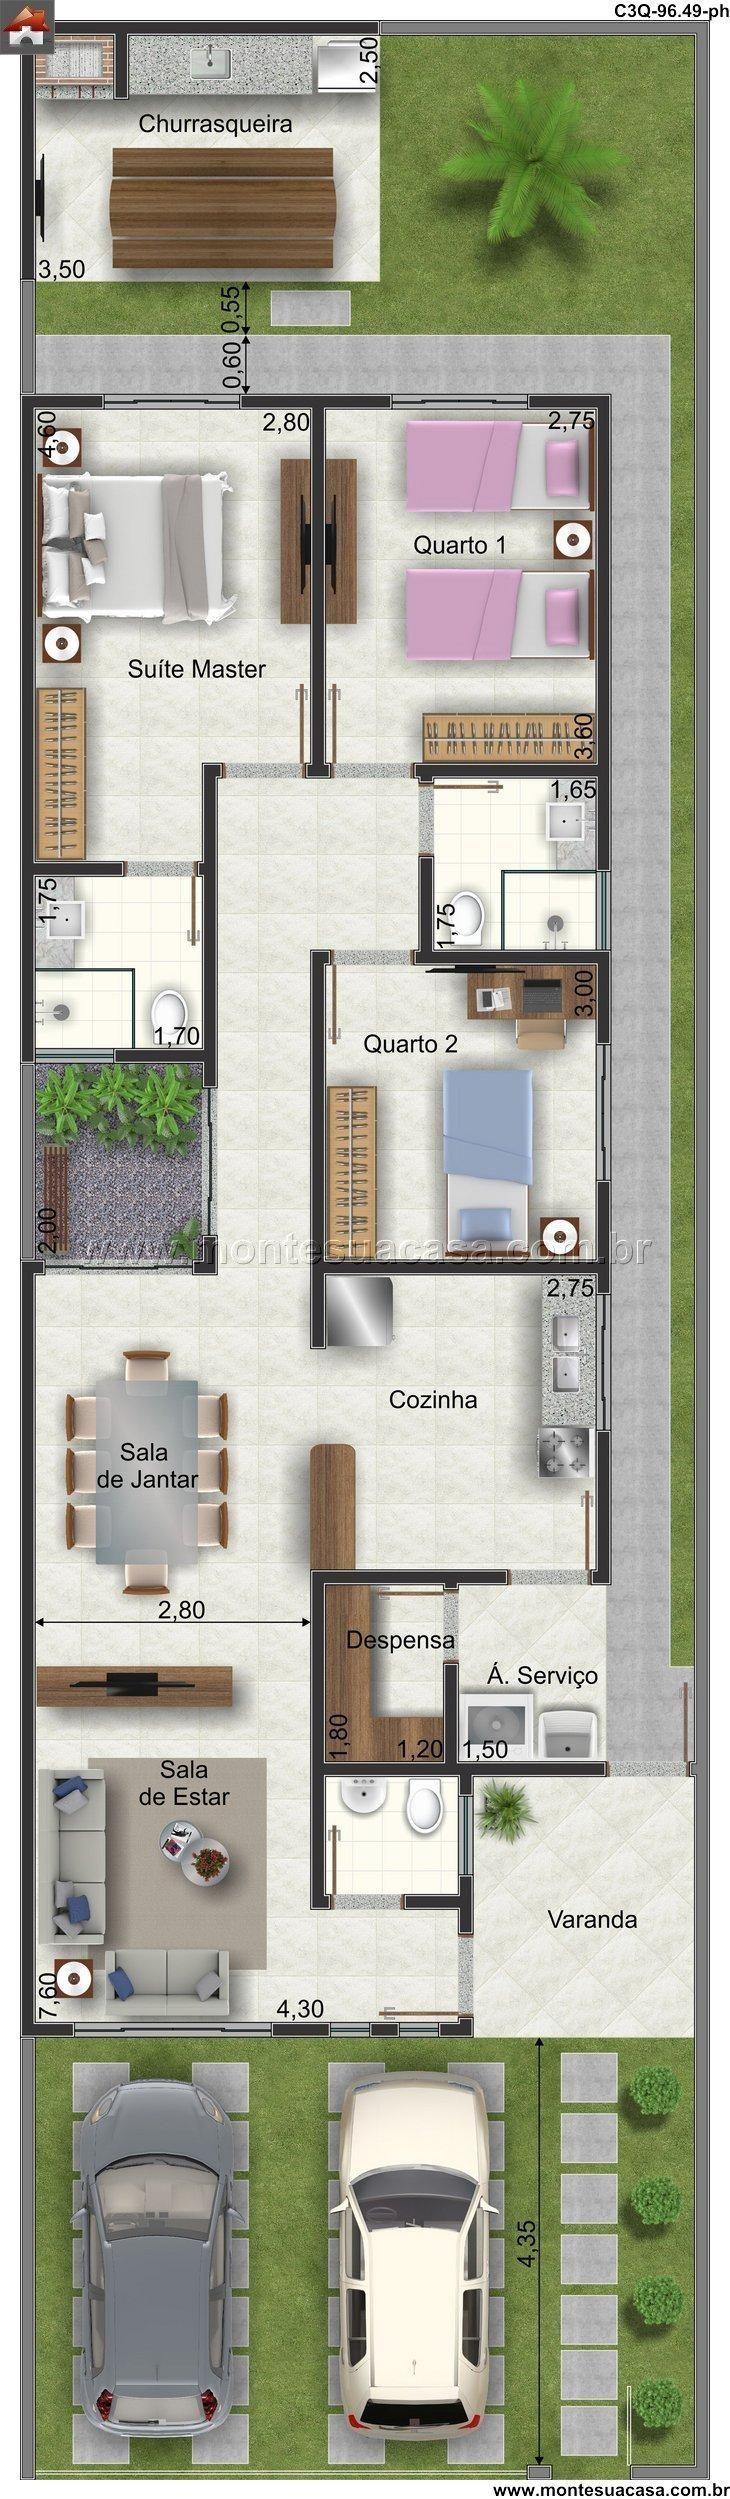 147 Modern House Plan Designs Free Download Part 55